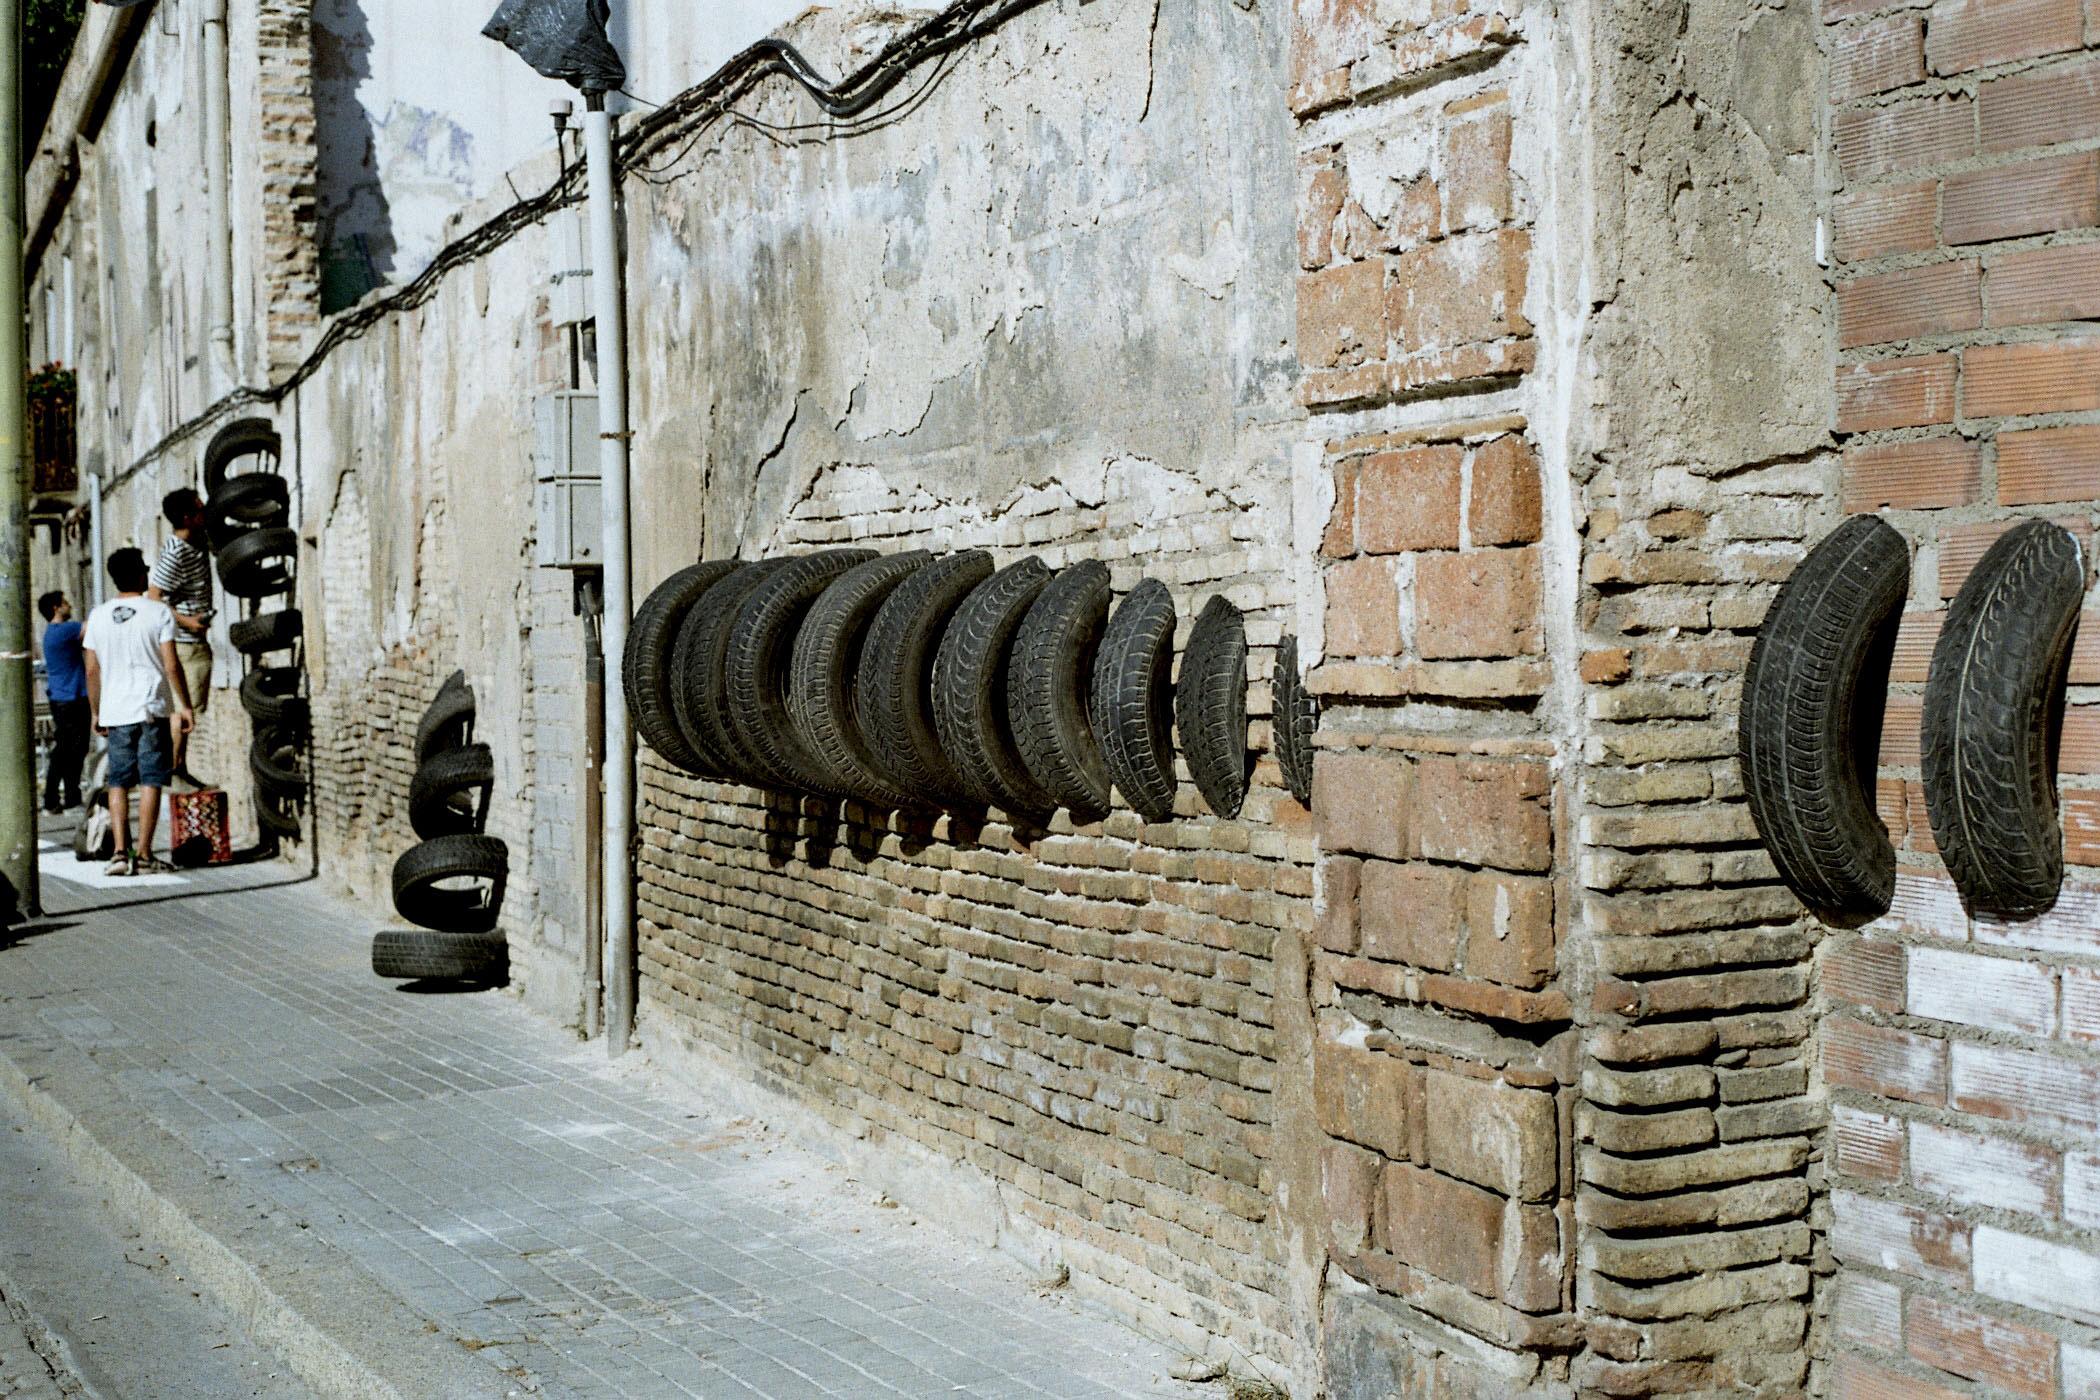 le pneu usag cet art de la rue barcelone mai 2015 chewing gomme. Black Bedroom Furniture Sets. Home Design Ideas